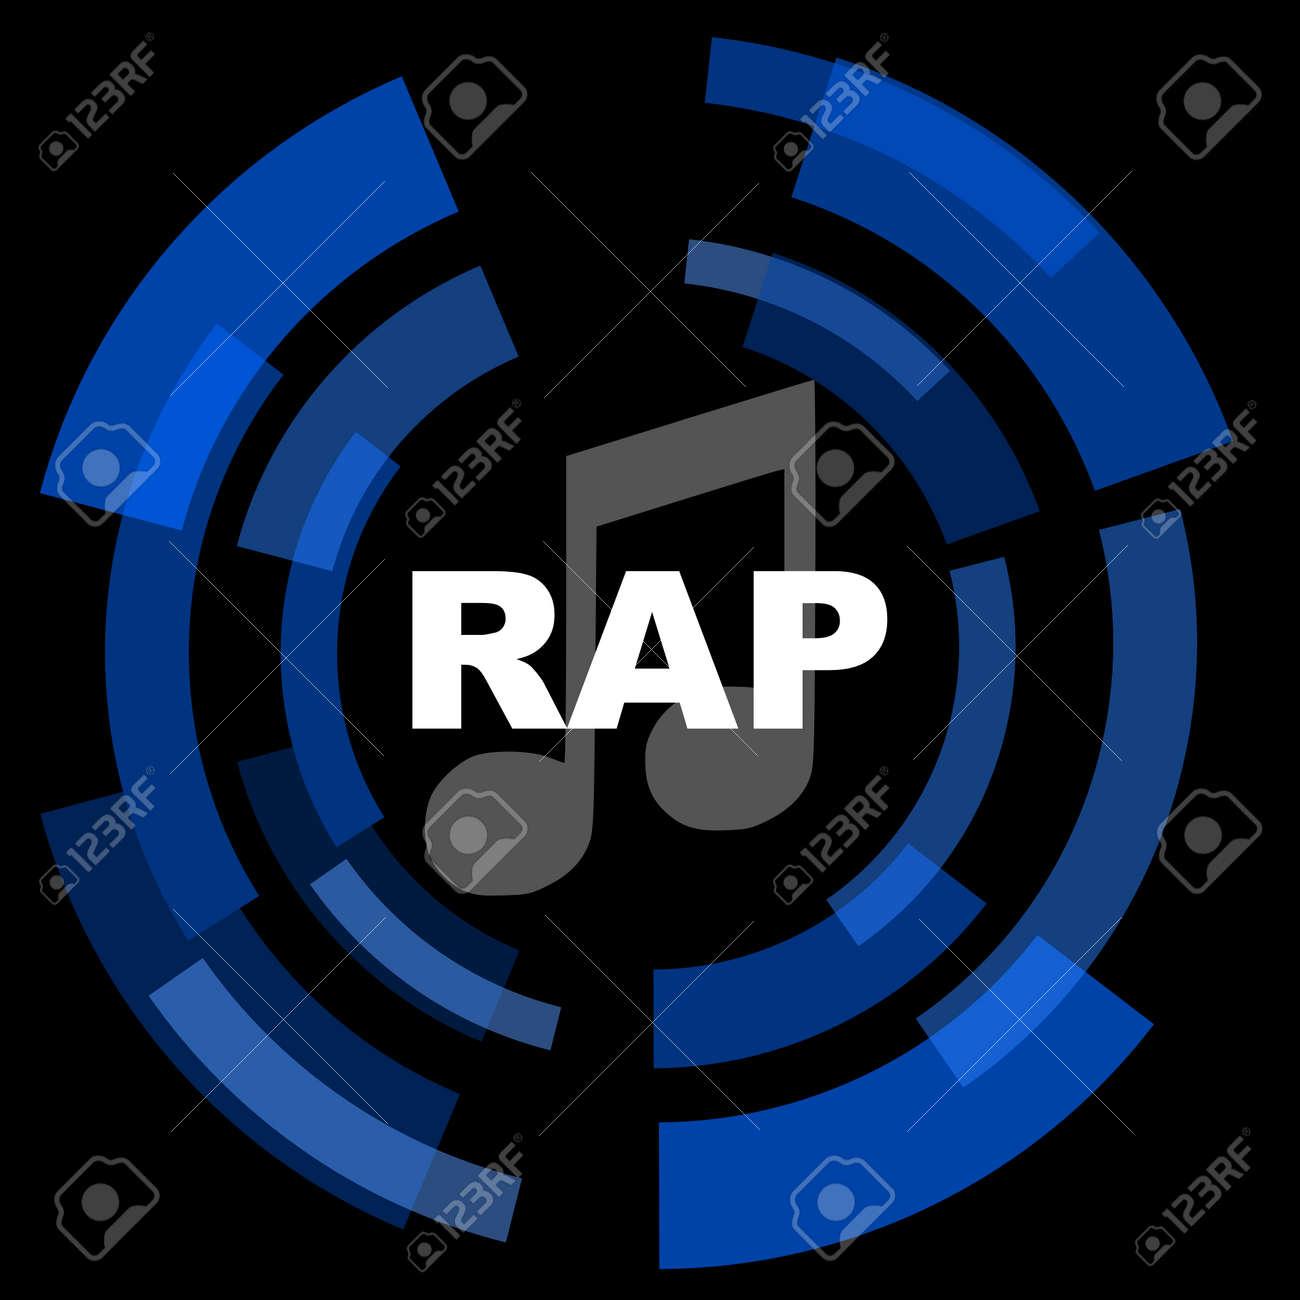 rap music black background simple web icon